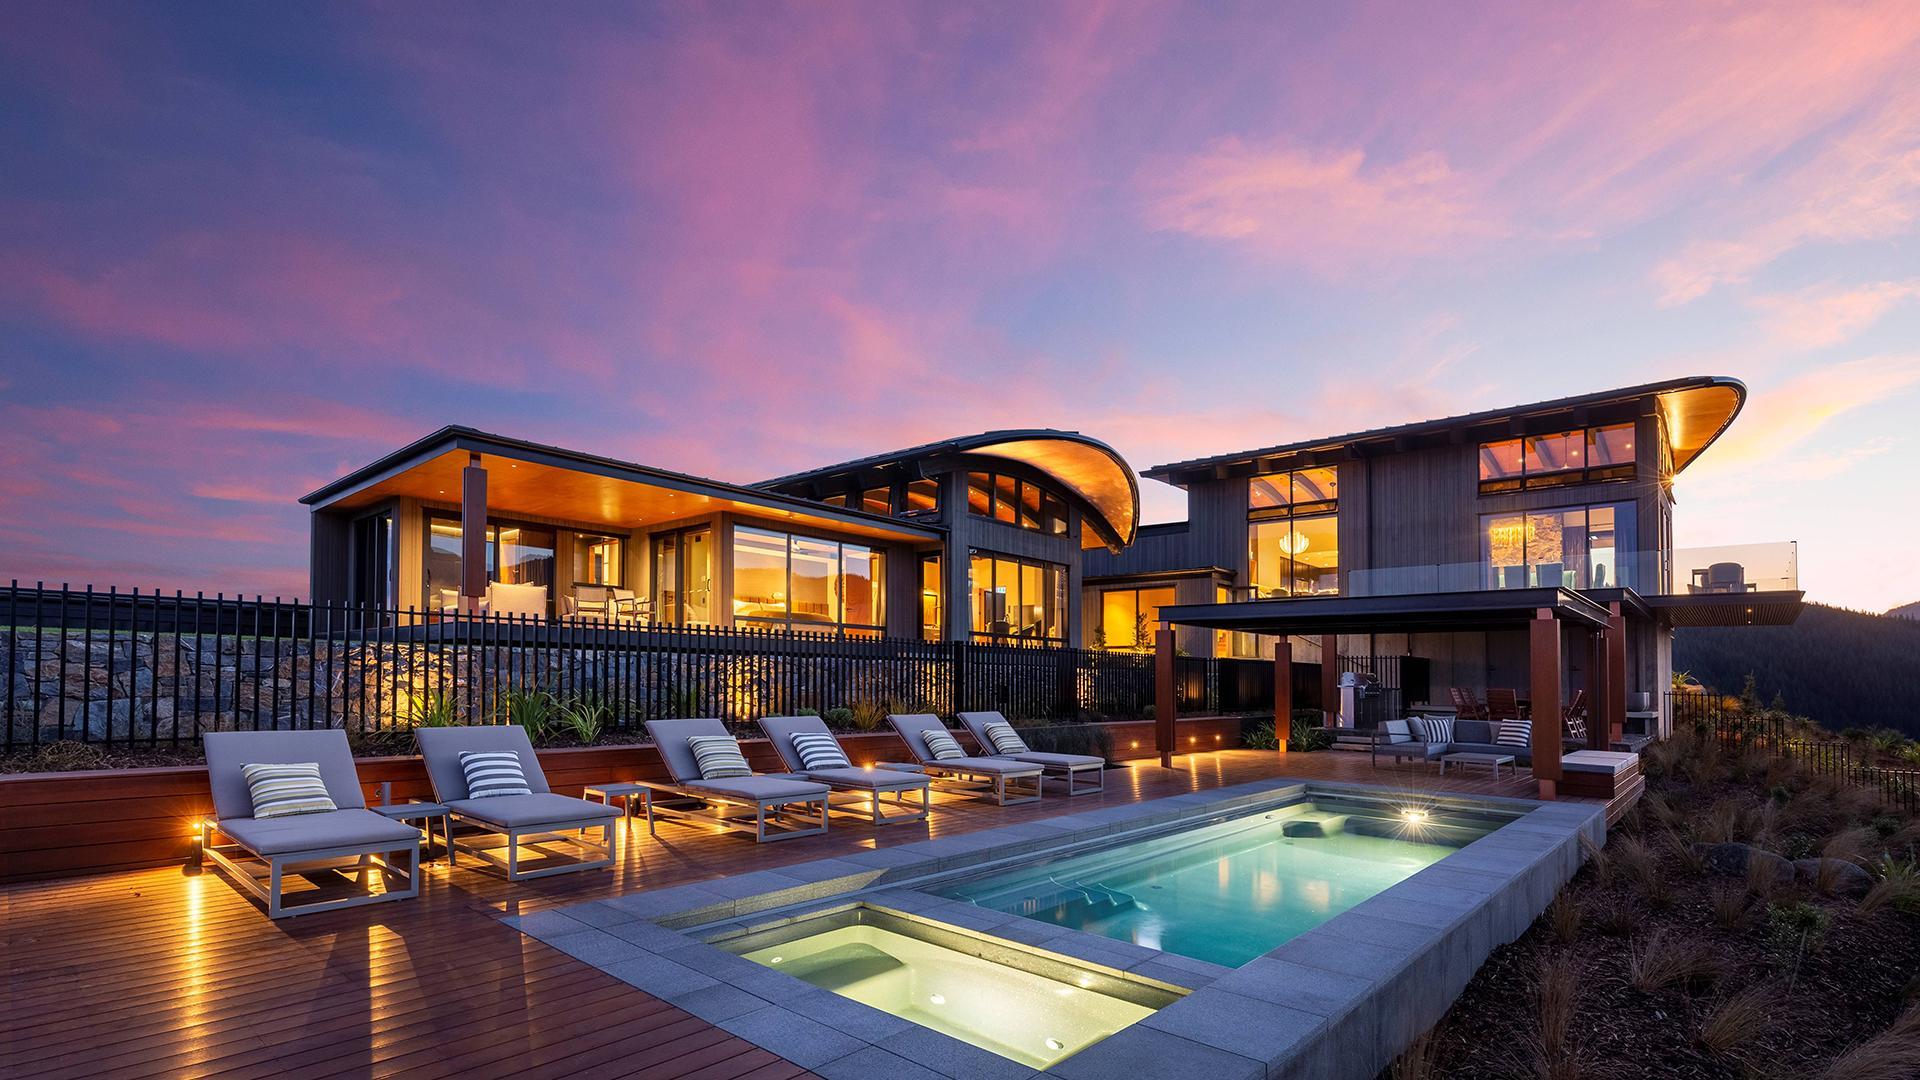 Entire Villa (Motueka Suite & Bunk Room, Kahurangi Suite and Tasman Suite) image 1 at Falcon Brae Villa by null, Tasman, New Zealand